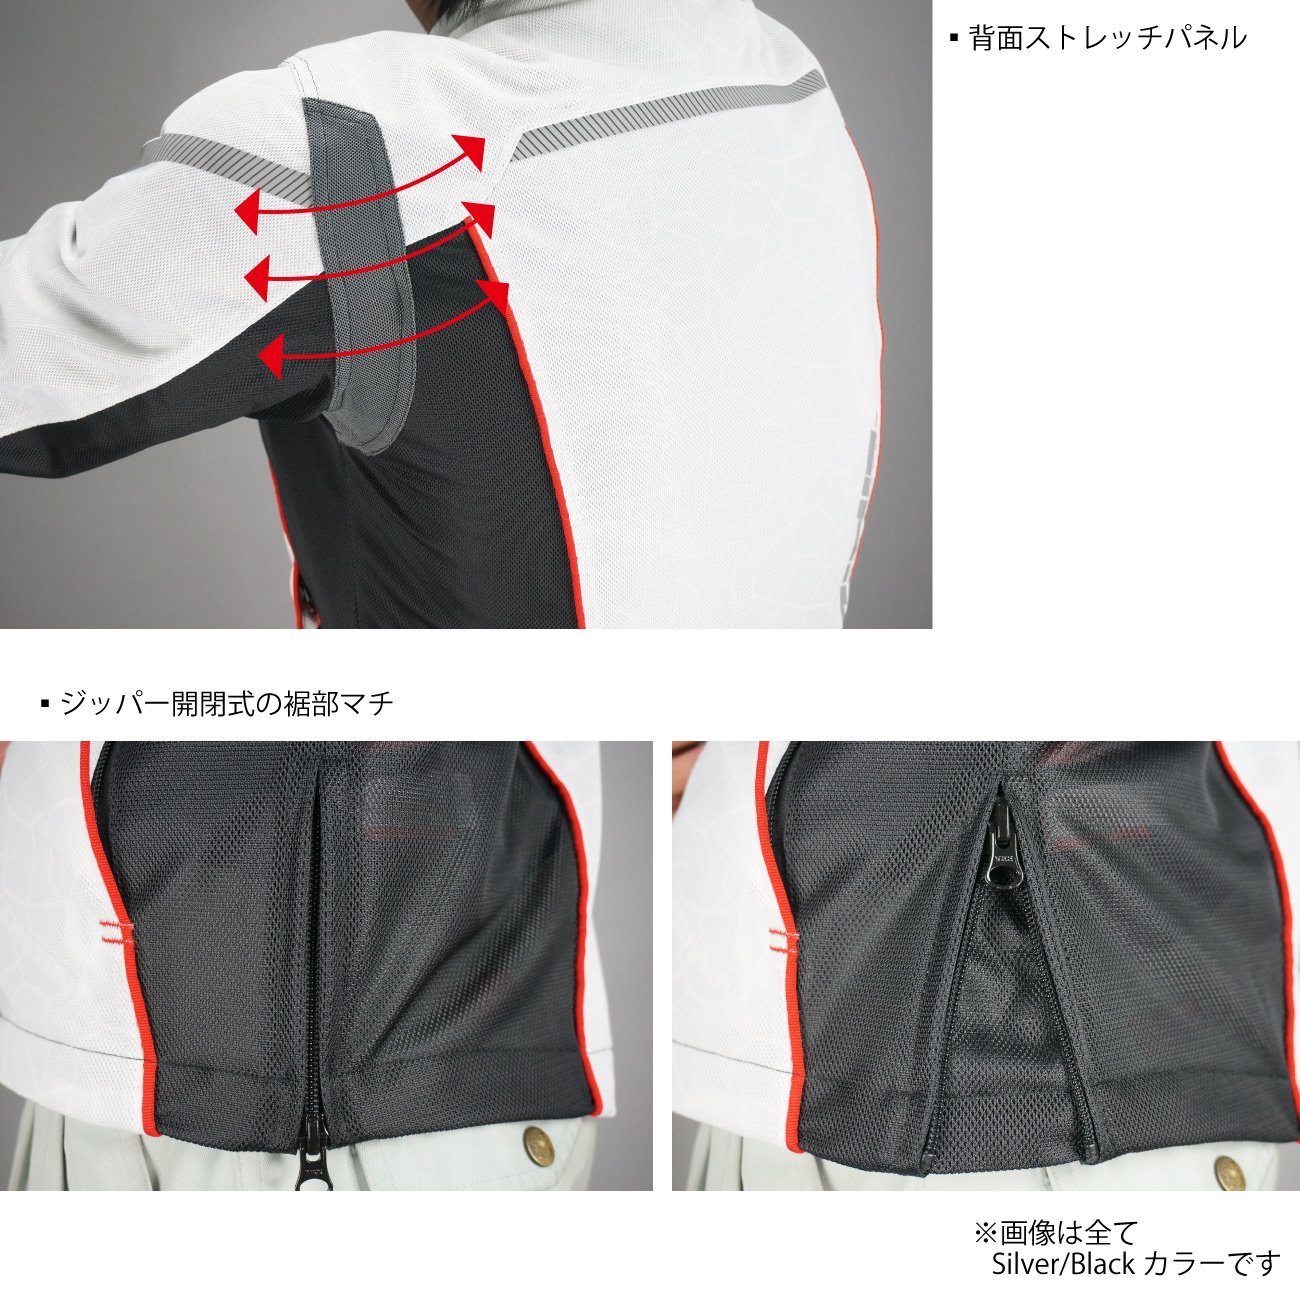 Protect Full M-JKT 07-128 コミネ プロテクトフルメッシュジャケット /(KOMINE/) Black JK-128 /(L/)